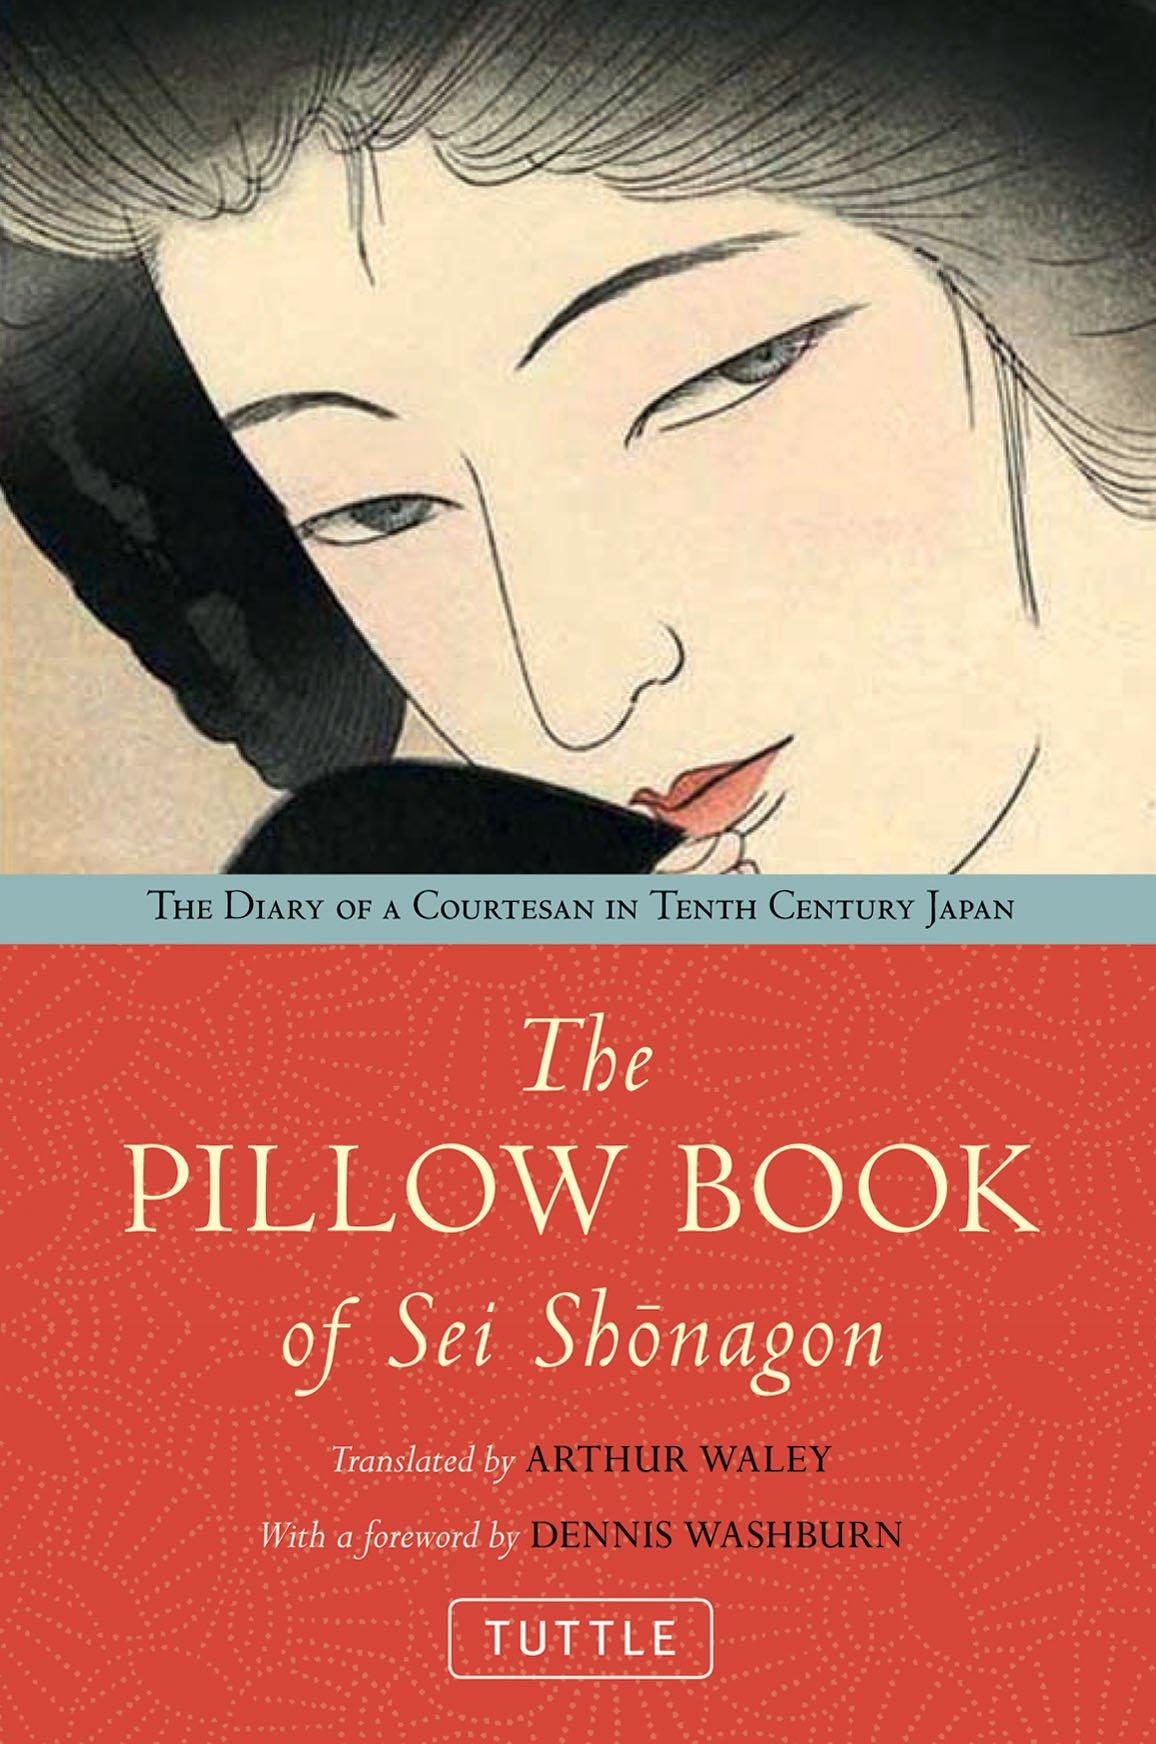 Amazon.com: The Pillow Book of Sei Shonagon: The Diary of a Courtesan in  Tenth Century Japan (8601200937435): Arthur Waley, Dennis Washburn: Books